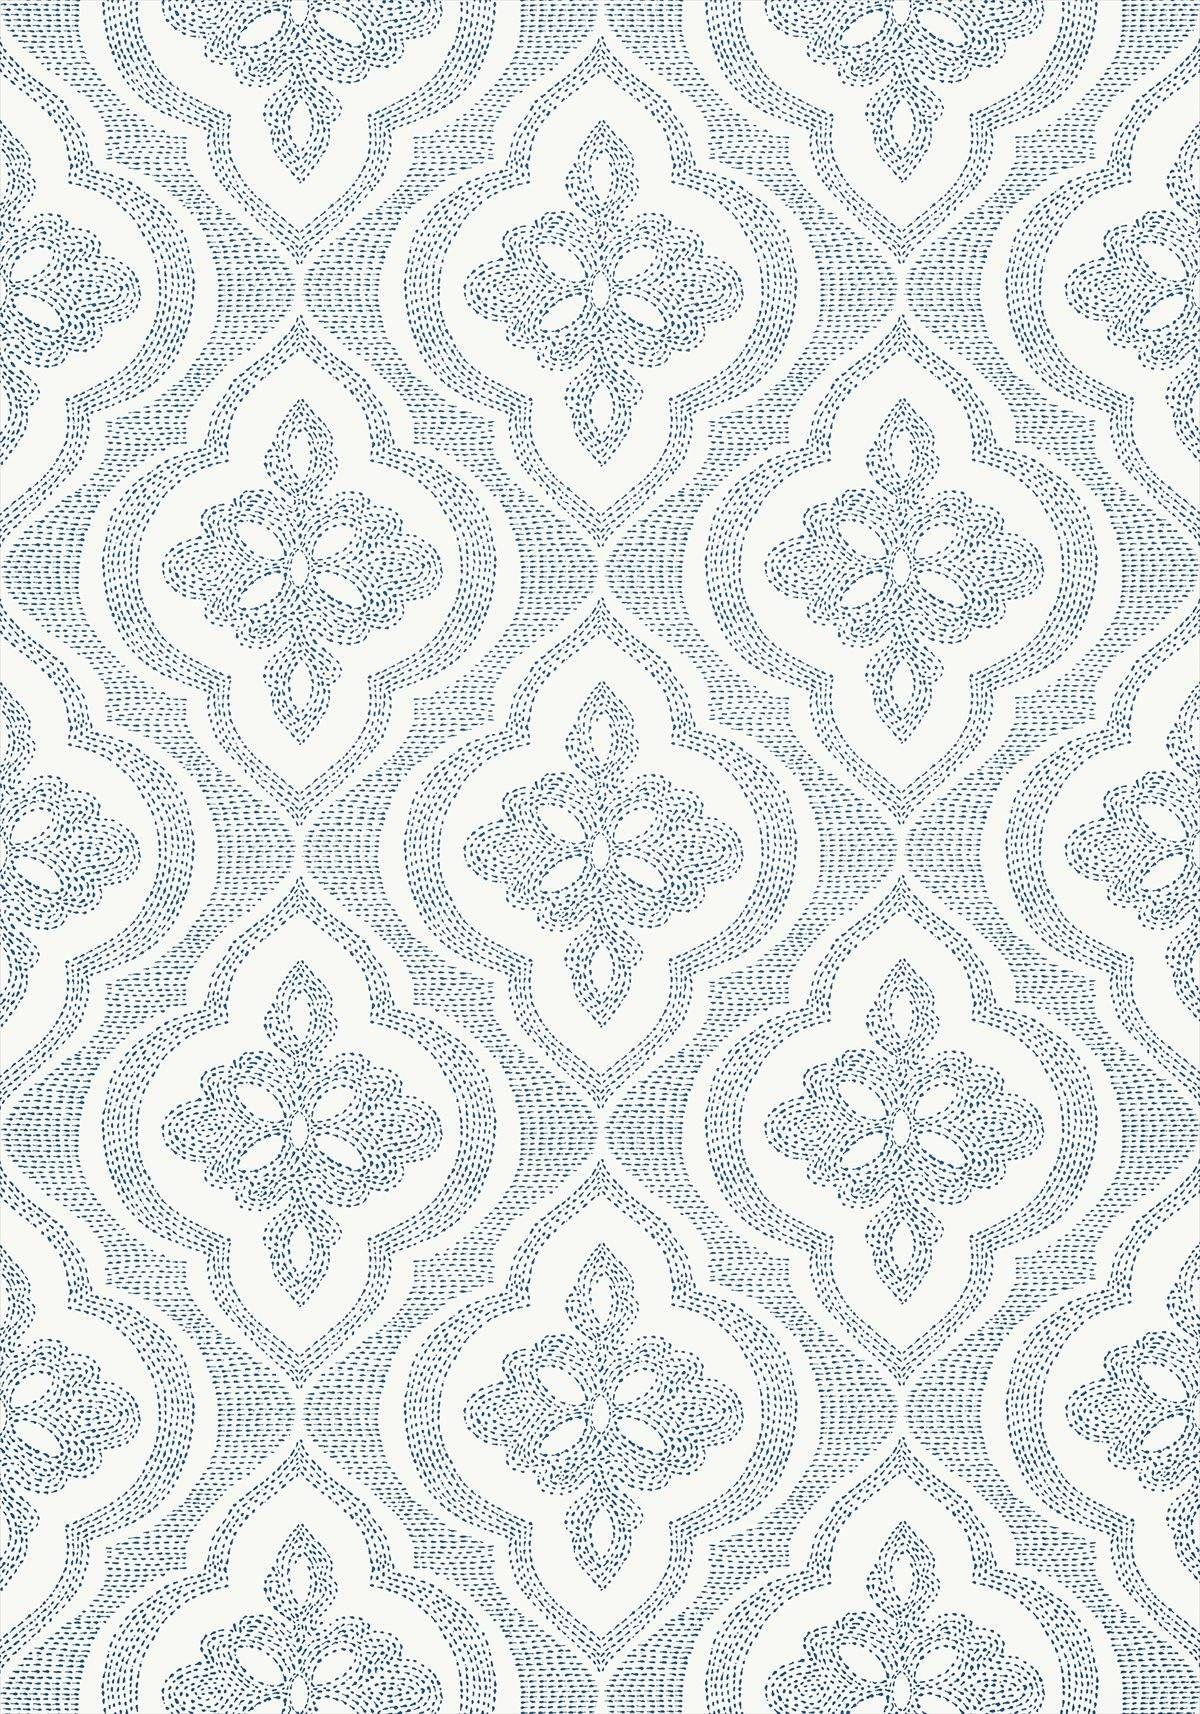 Ophelia 839 T 2995 Fabric Wallpaper Thibaut Wallpaper Navy Wallpaper